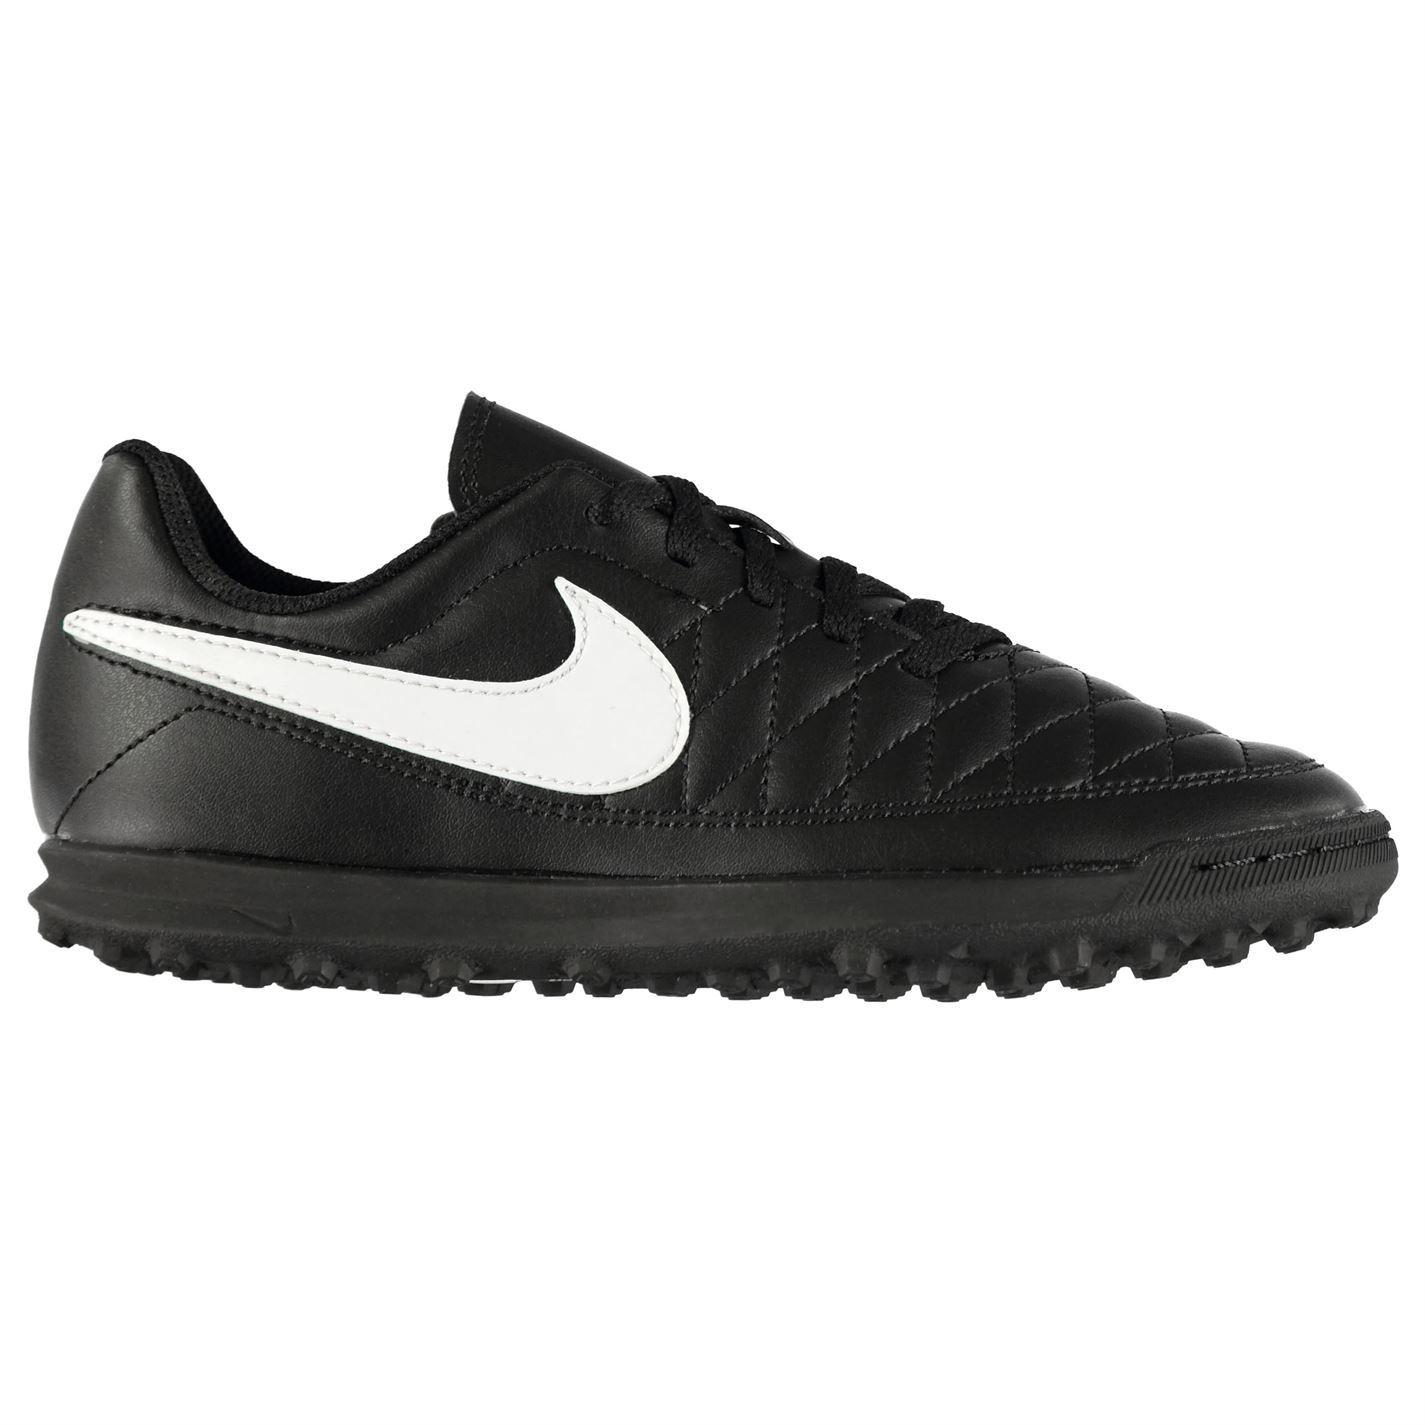 Nike-majestry-Astro-Turf-Football-Baskets-Juniors-Football-Baskets-Chaussures miniature 8